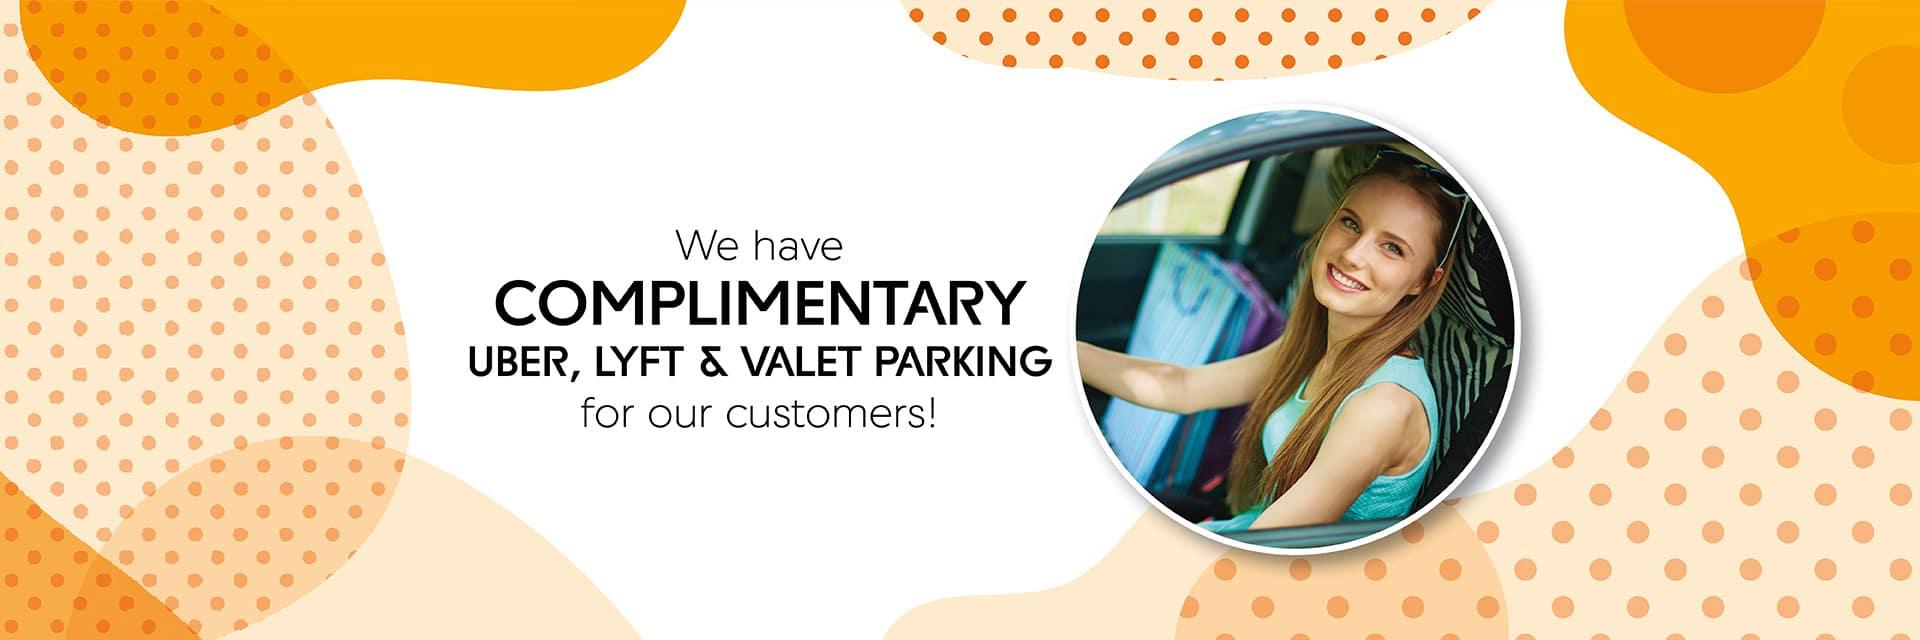 Uber, Lyft, Valet Parking